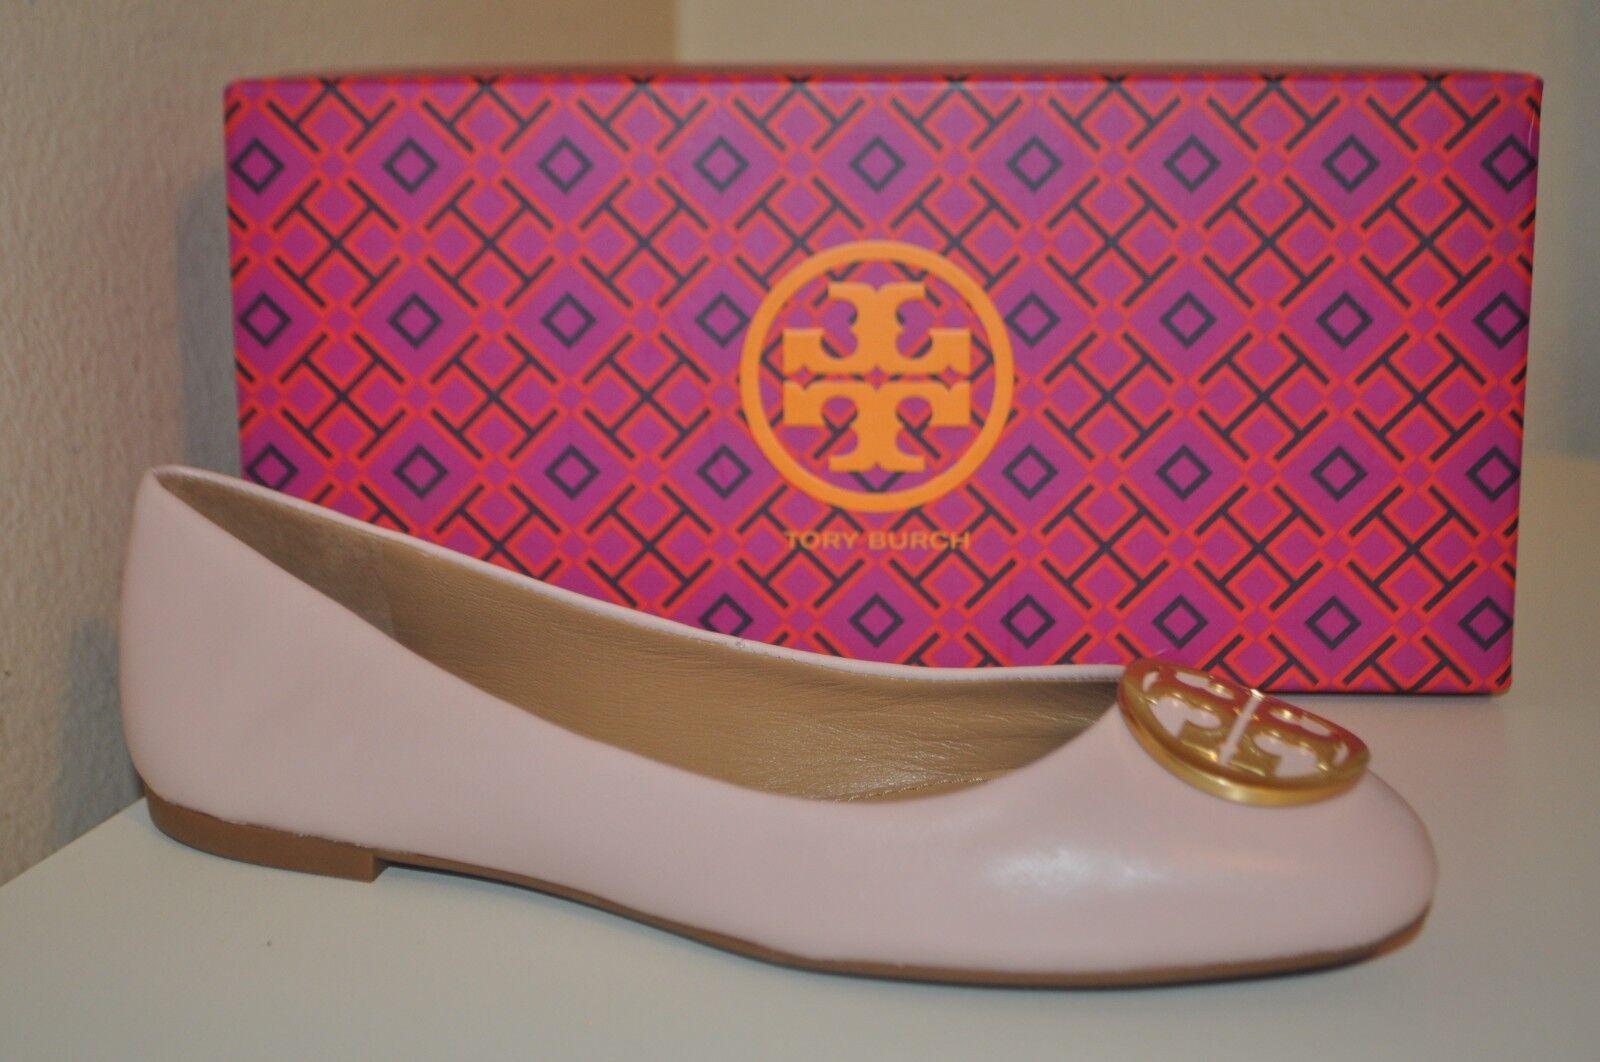 Nuevo En Caja Tory Burch Benton Ballet Zapato Zapato Zapato Plano oro Logo Sea Shell rosado De Cuero Talla 7.5 M  envio rapido a ti